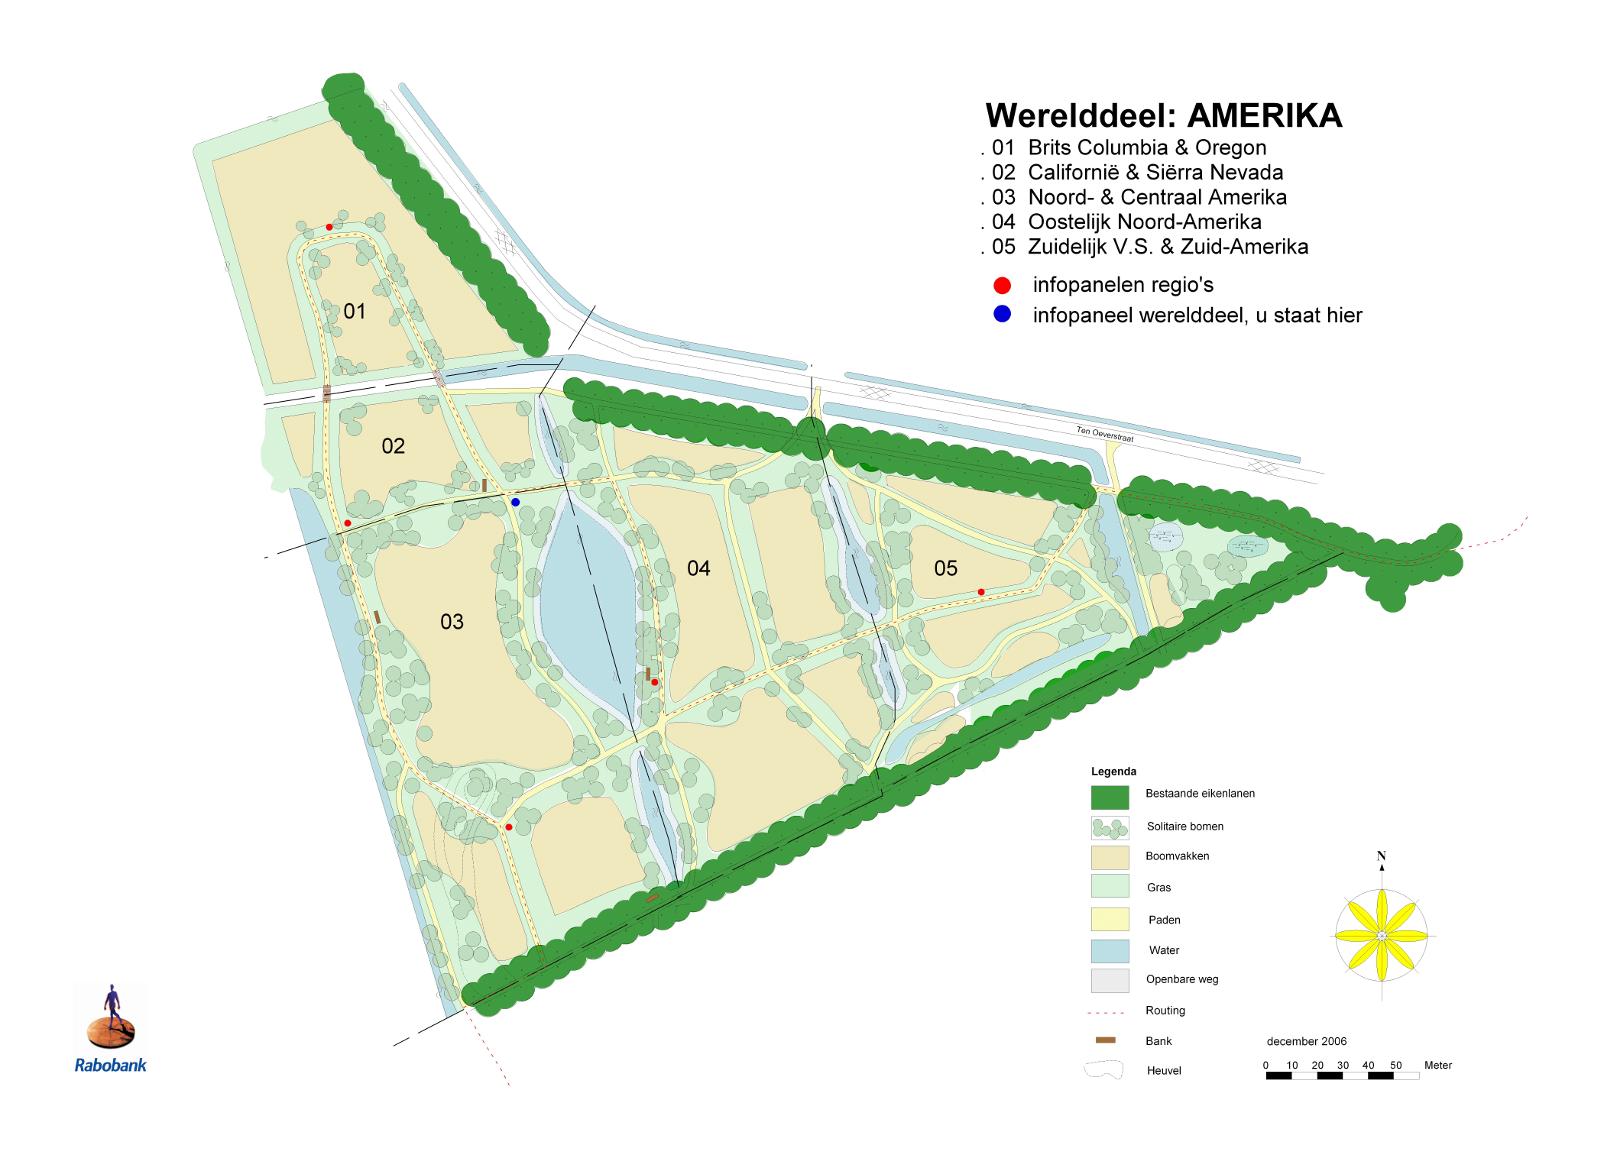 "<a href=""/kaarten/Amerika2007.pdf"" target=""_blank""><img class=""alignright size-thumbnail wp-image-767"" src=""http://arboretum-assen.nl/wp-content/uploads/2016/01/afdrukken-2-150x35.png"" alt=""afdrukken"" width=""125"" height=""30"" /></a>"